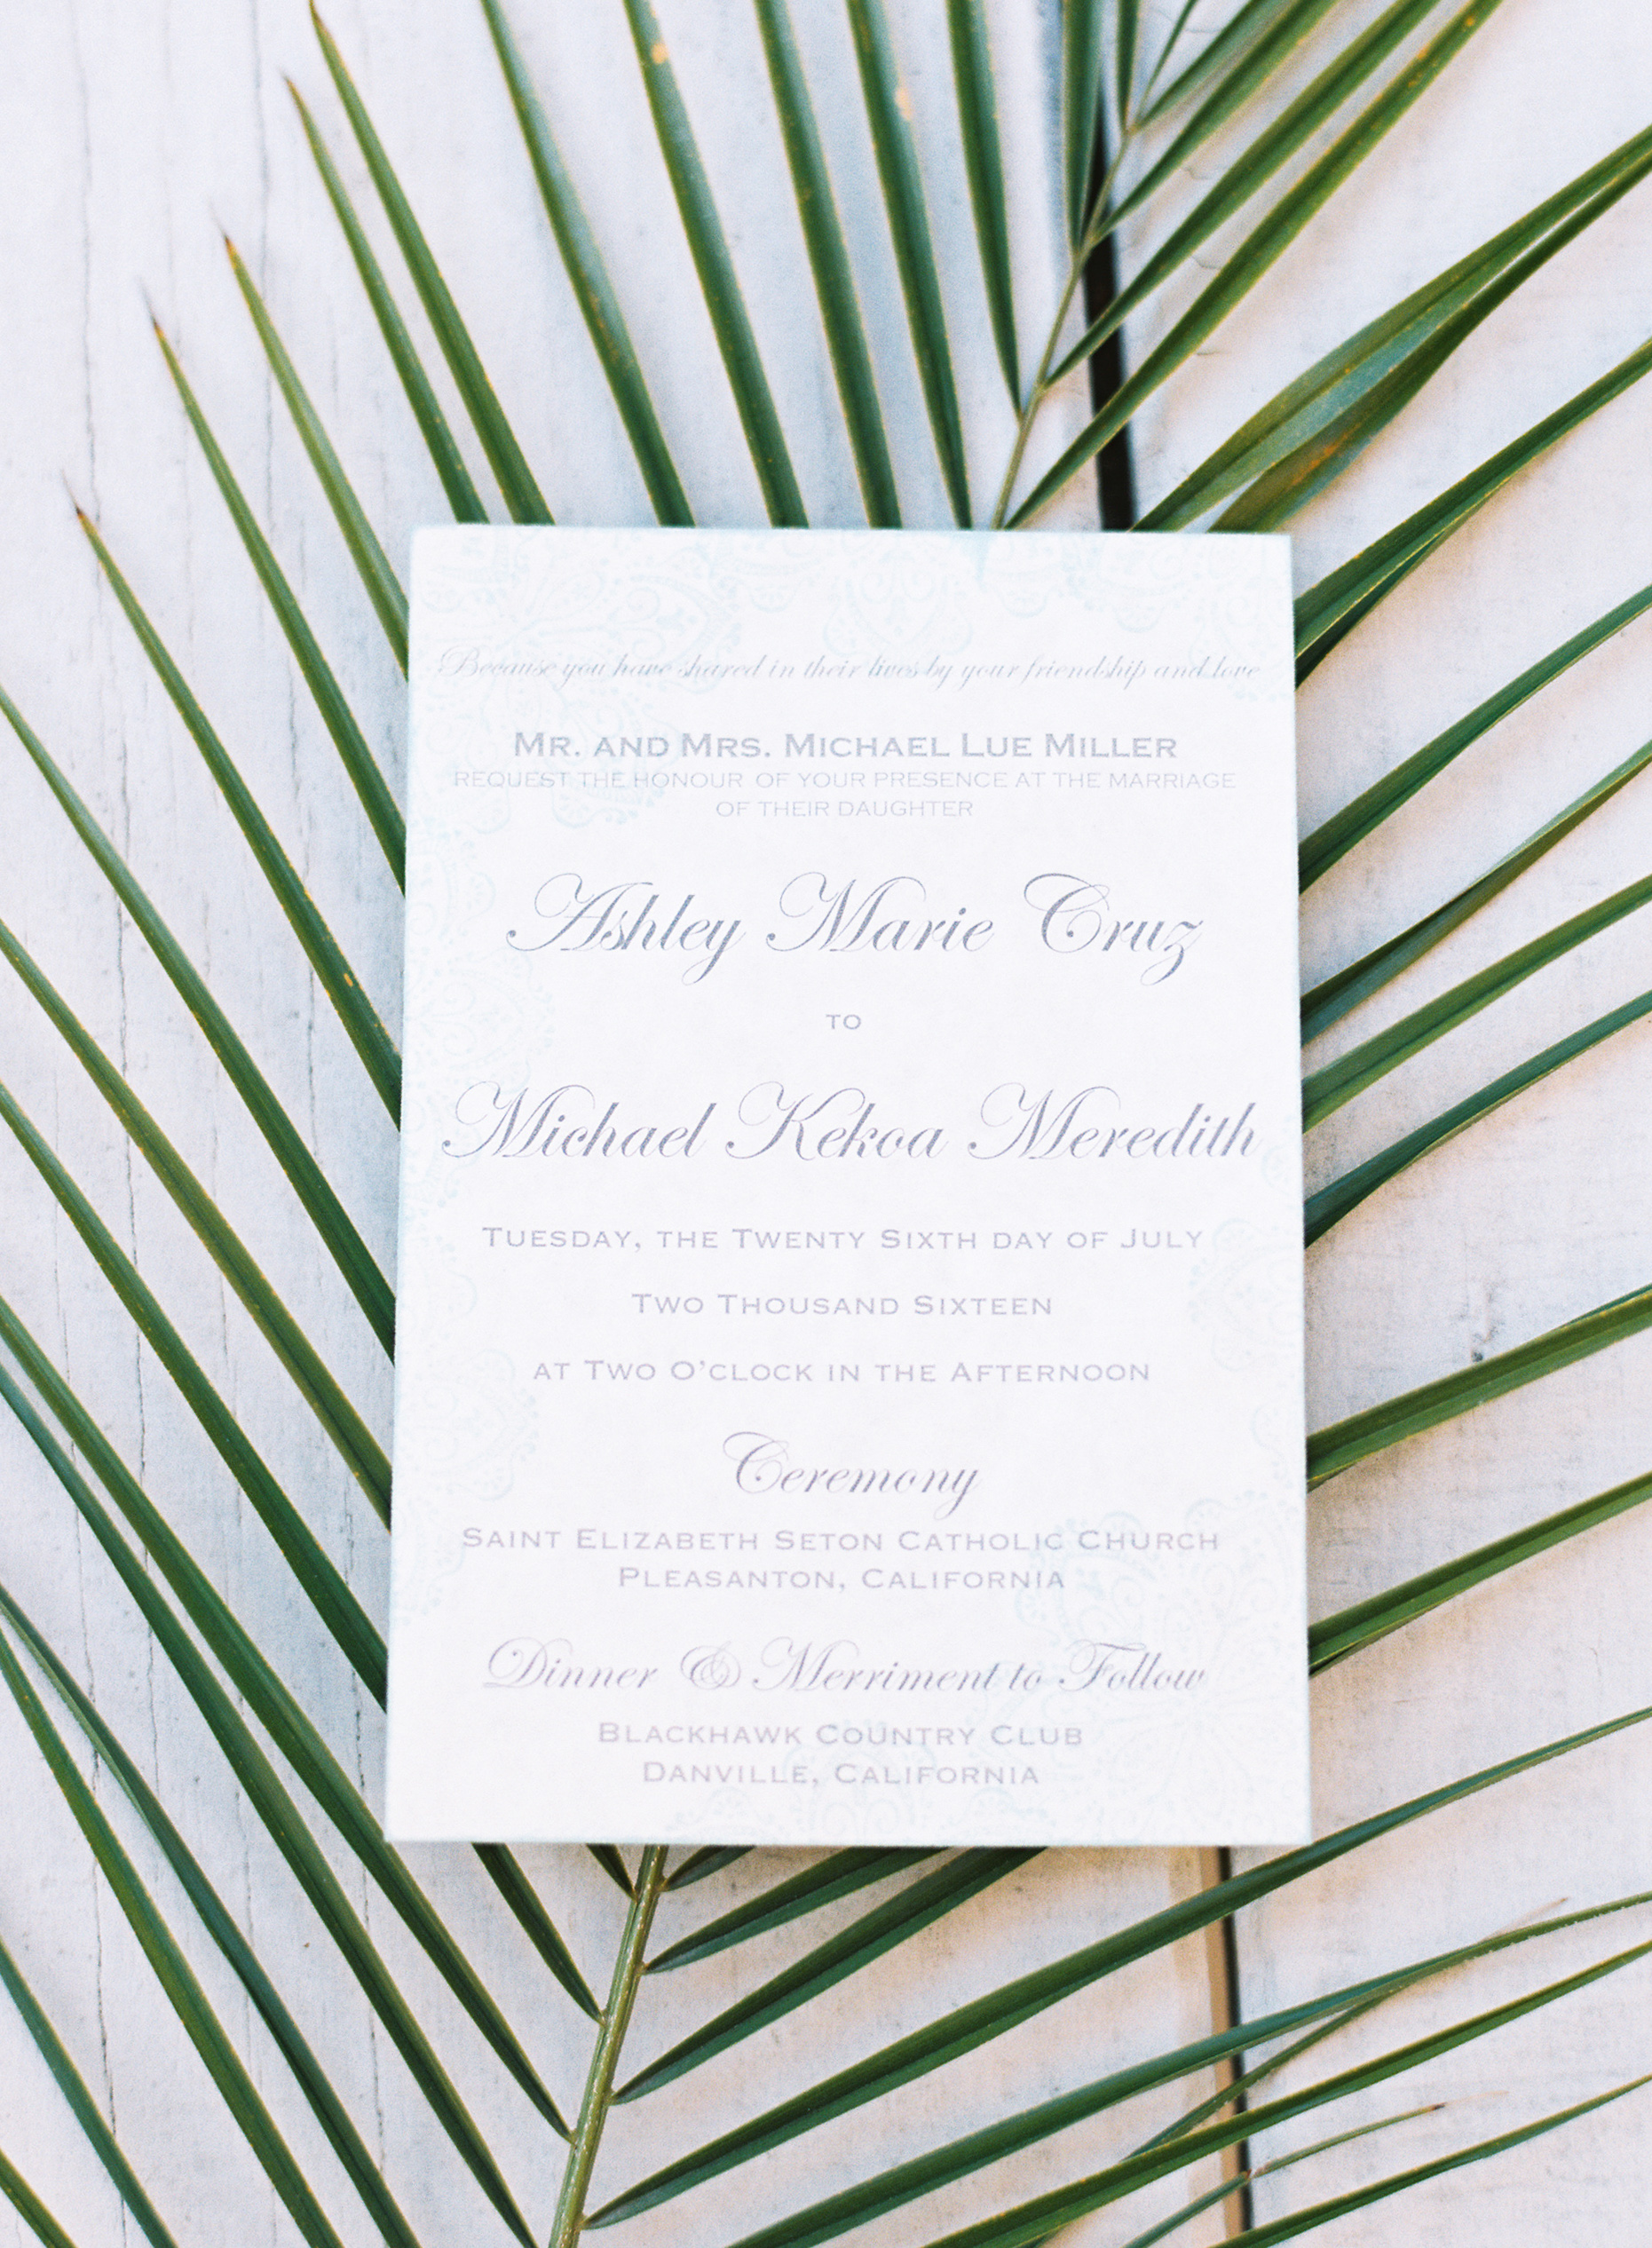 hawaiian-inspired-wedding-in-danville-california-009-2.jpg